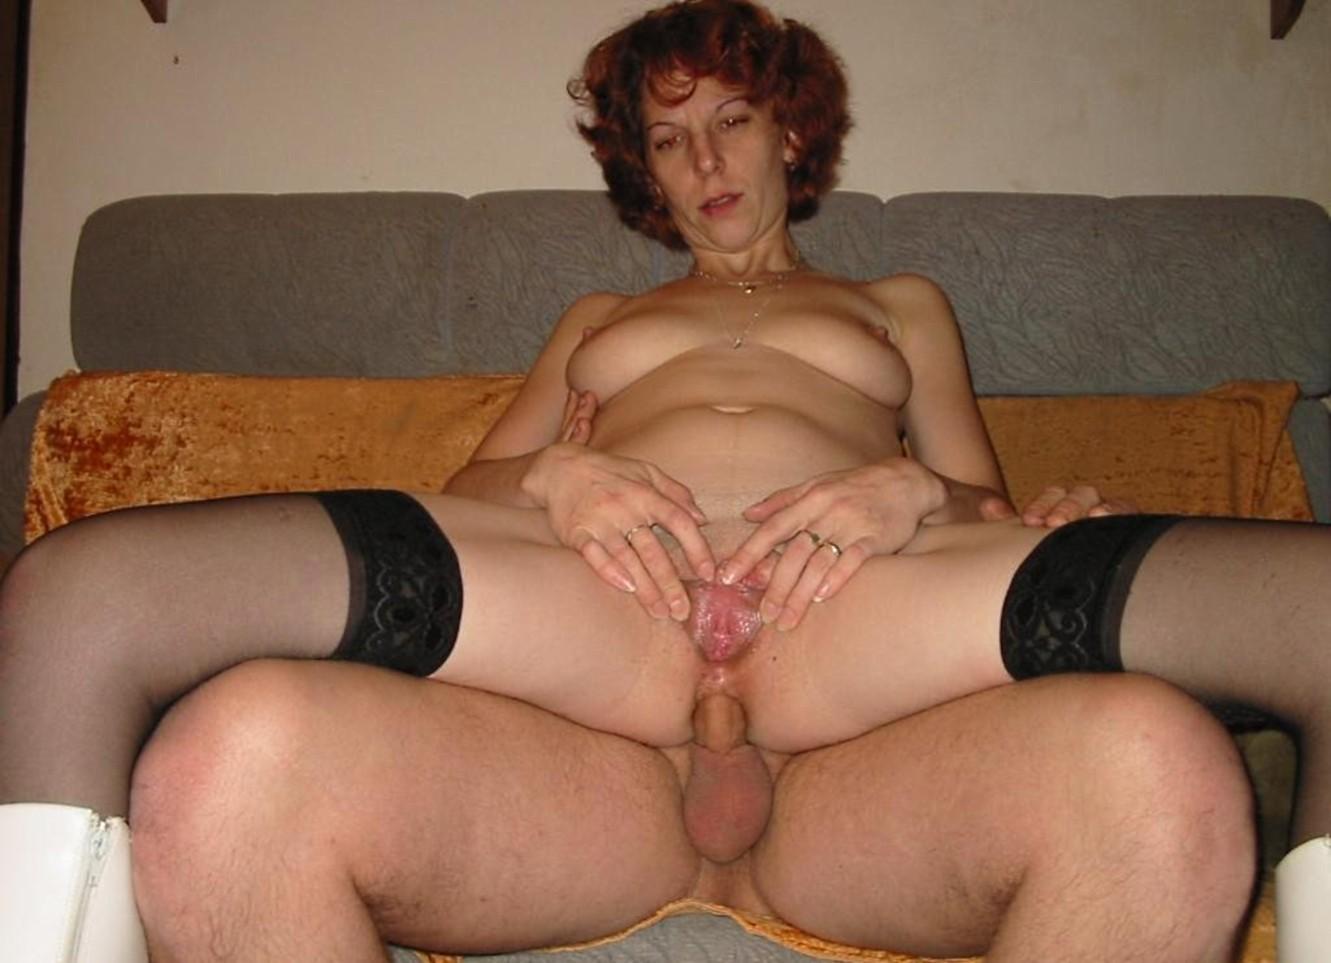 Просто фото домашнего секса - компиляция 5